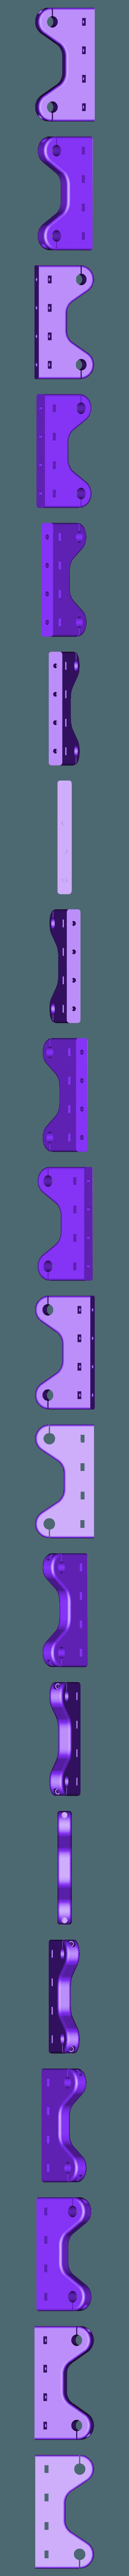 SUPPORT_DOWN.stl Download free STL file COLUMN DRILL • Design to 3D print, Pipapelaa